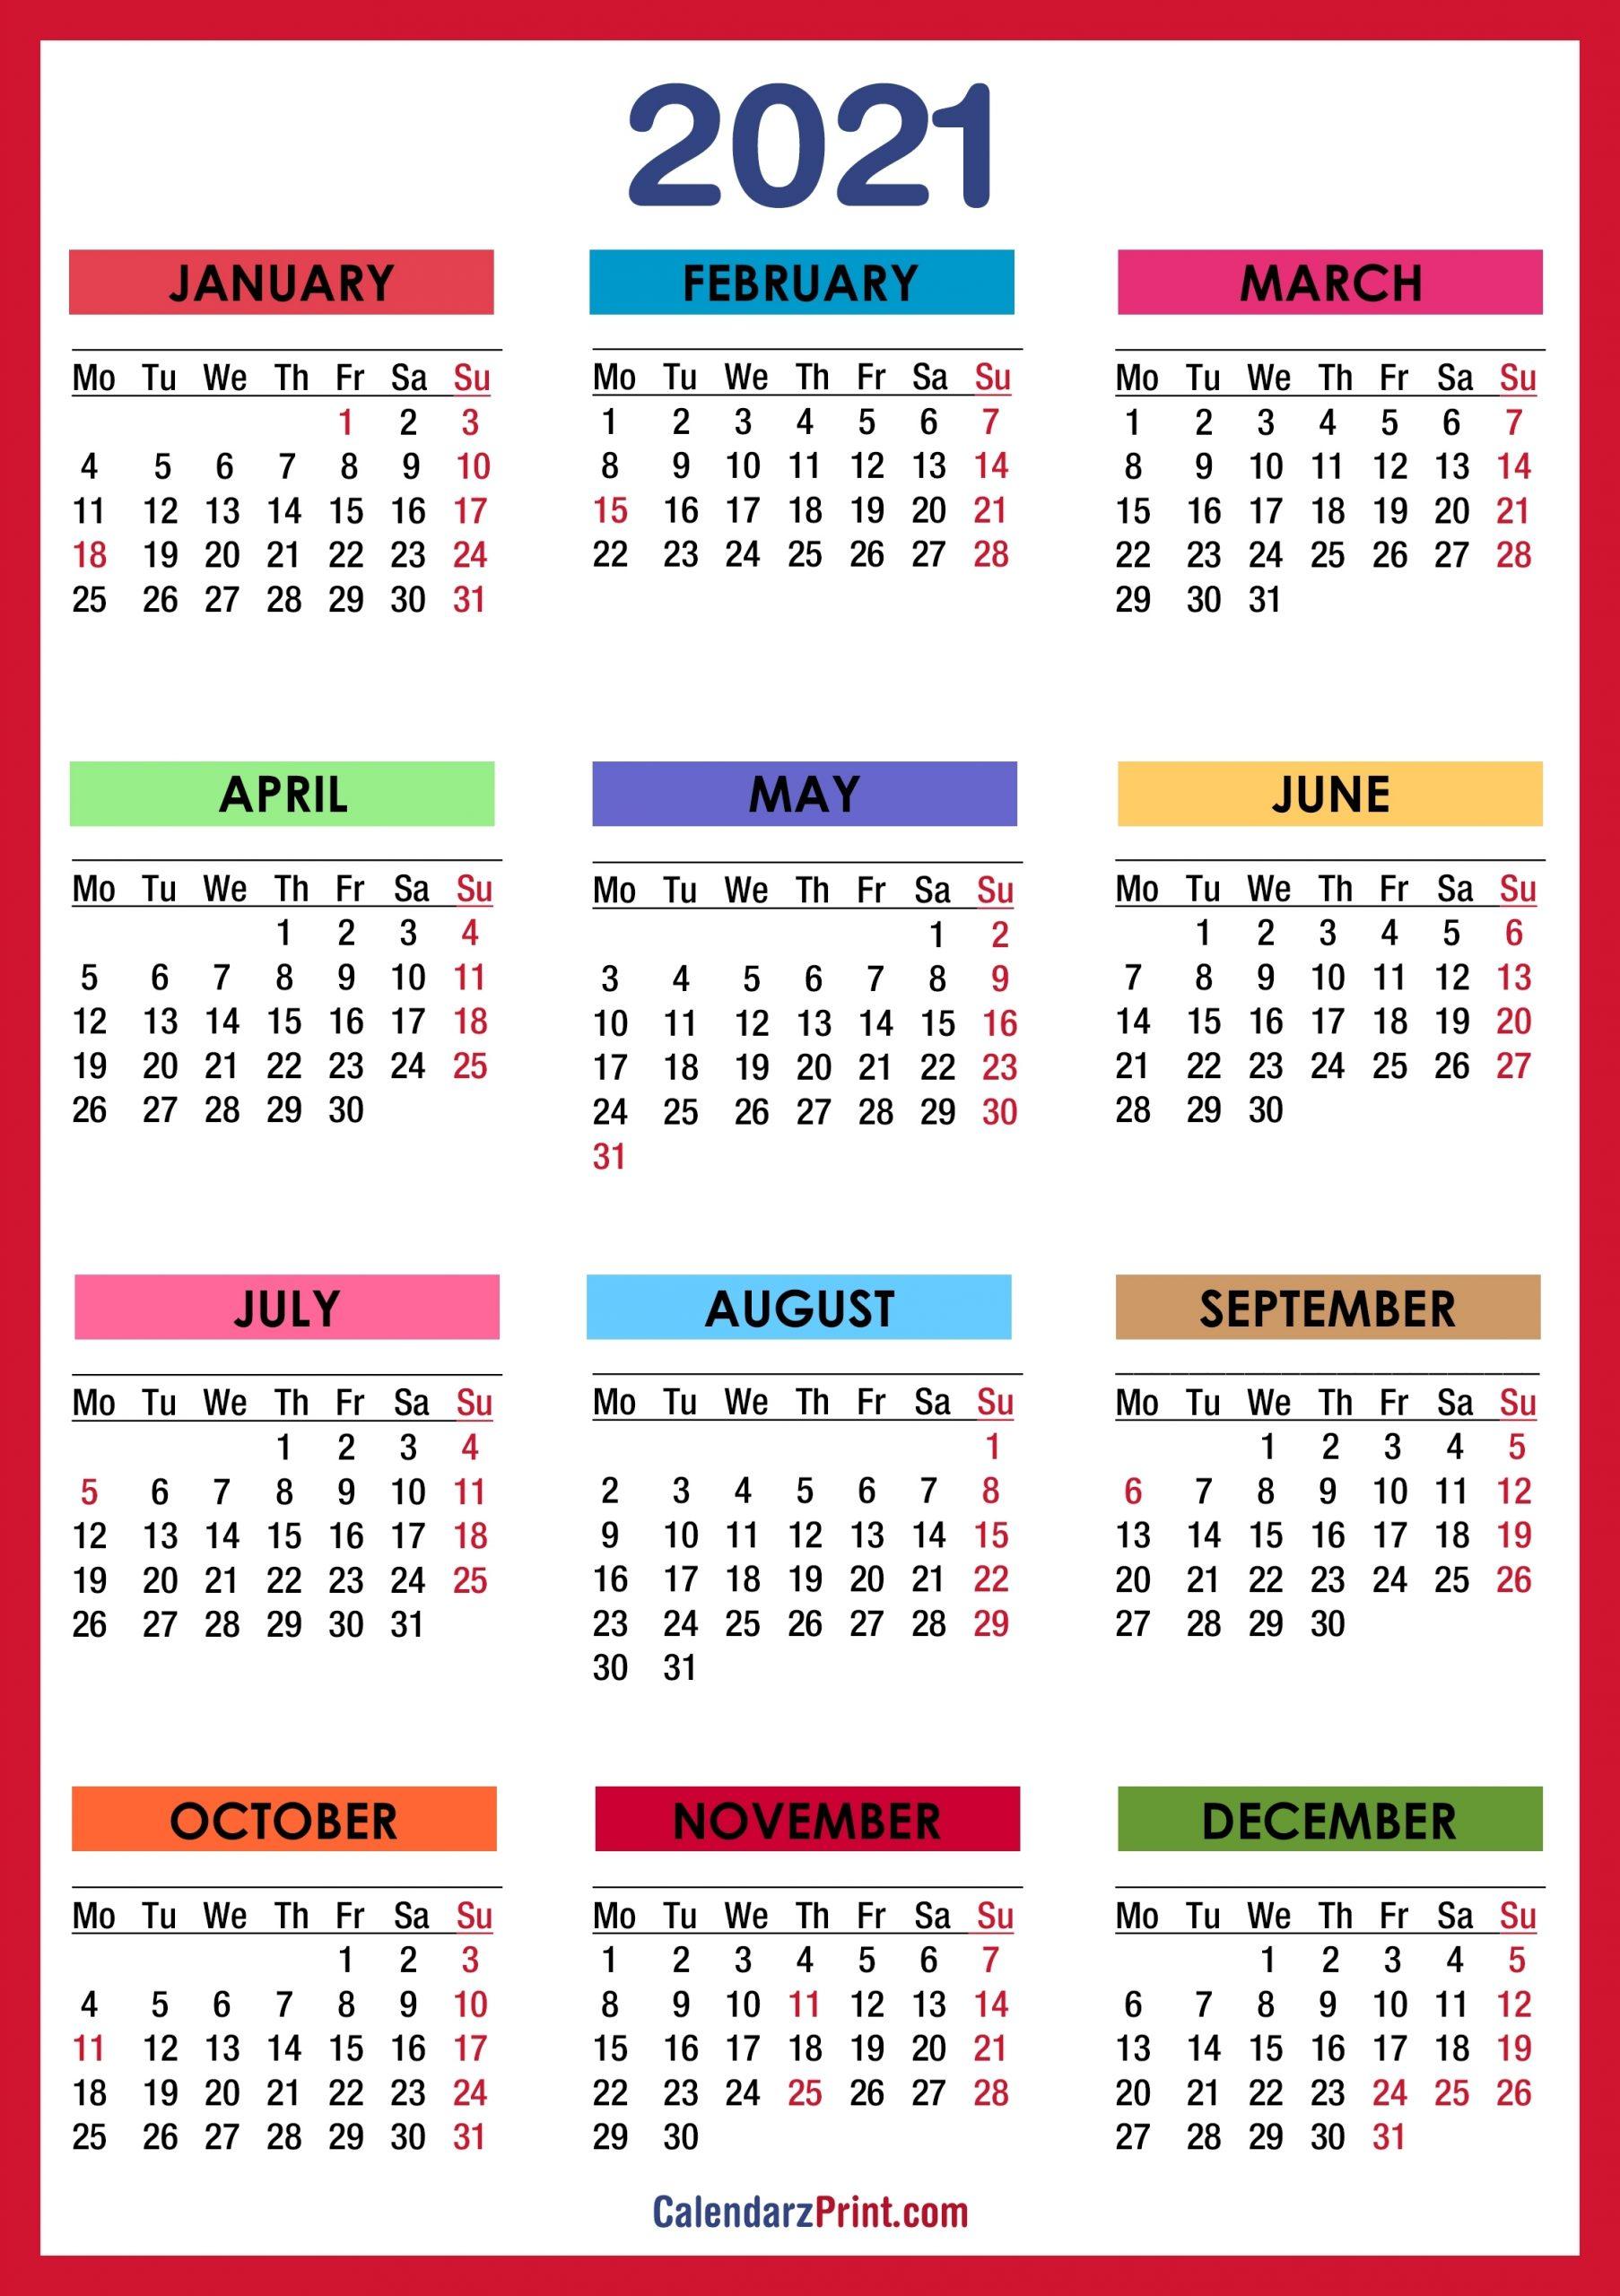 Pick 2021 Calendar With Holidays